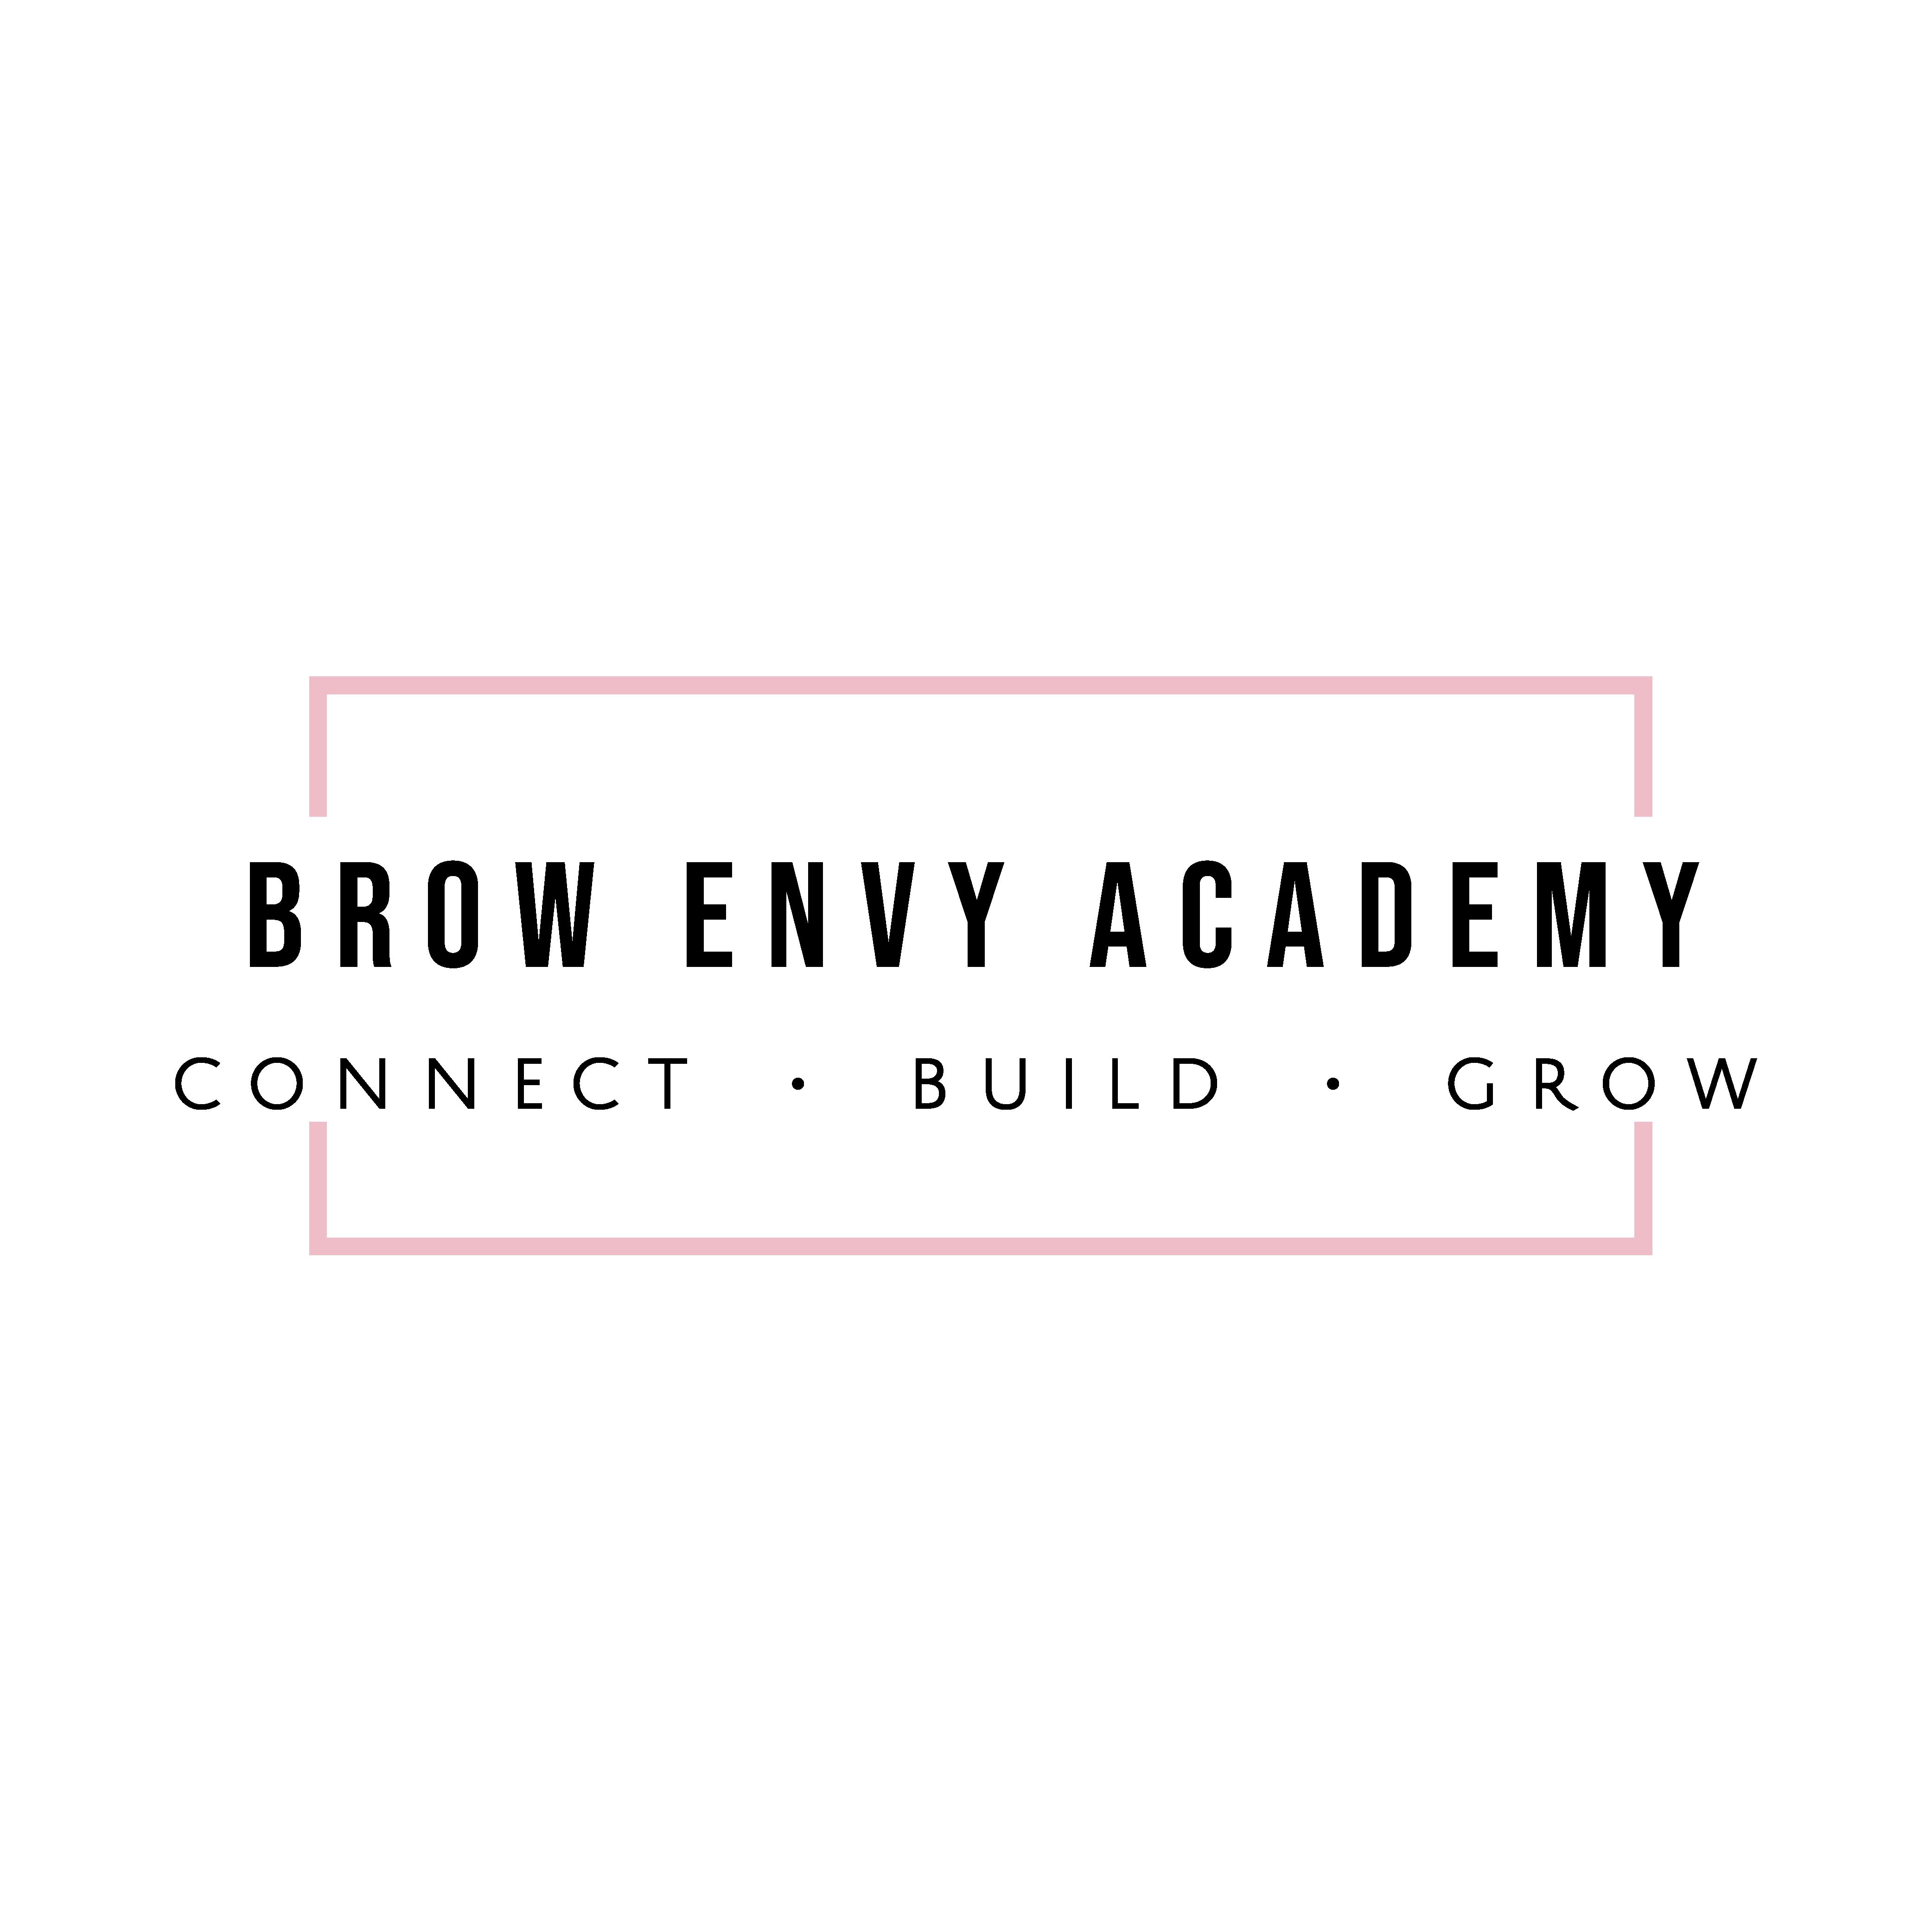 Brow Envy Academy